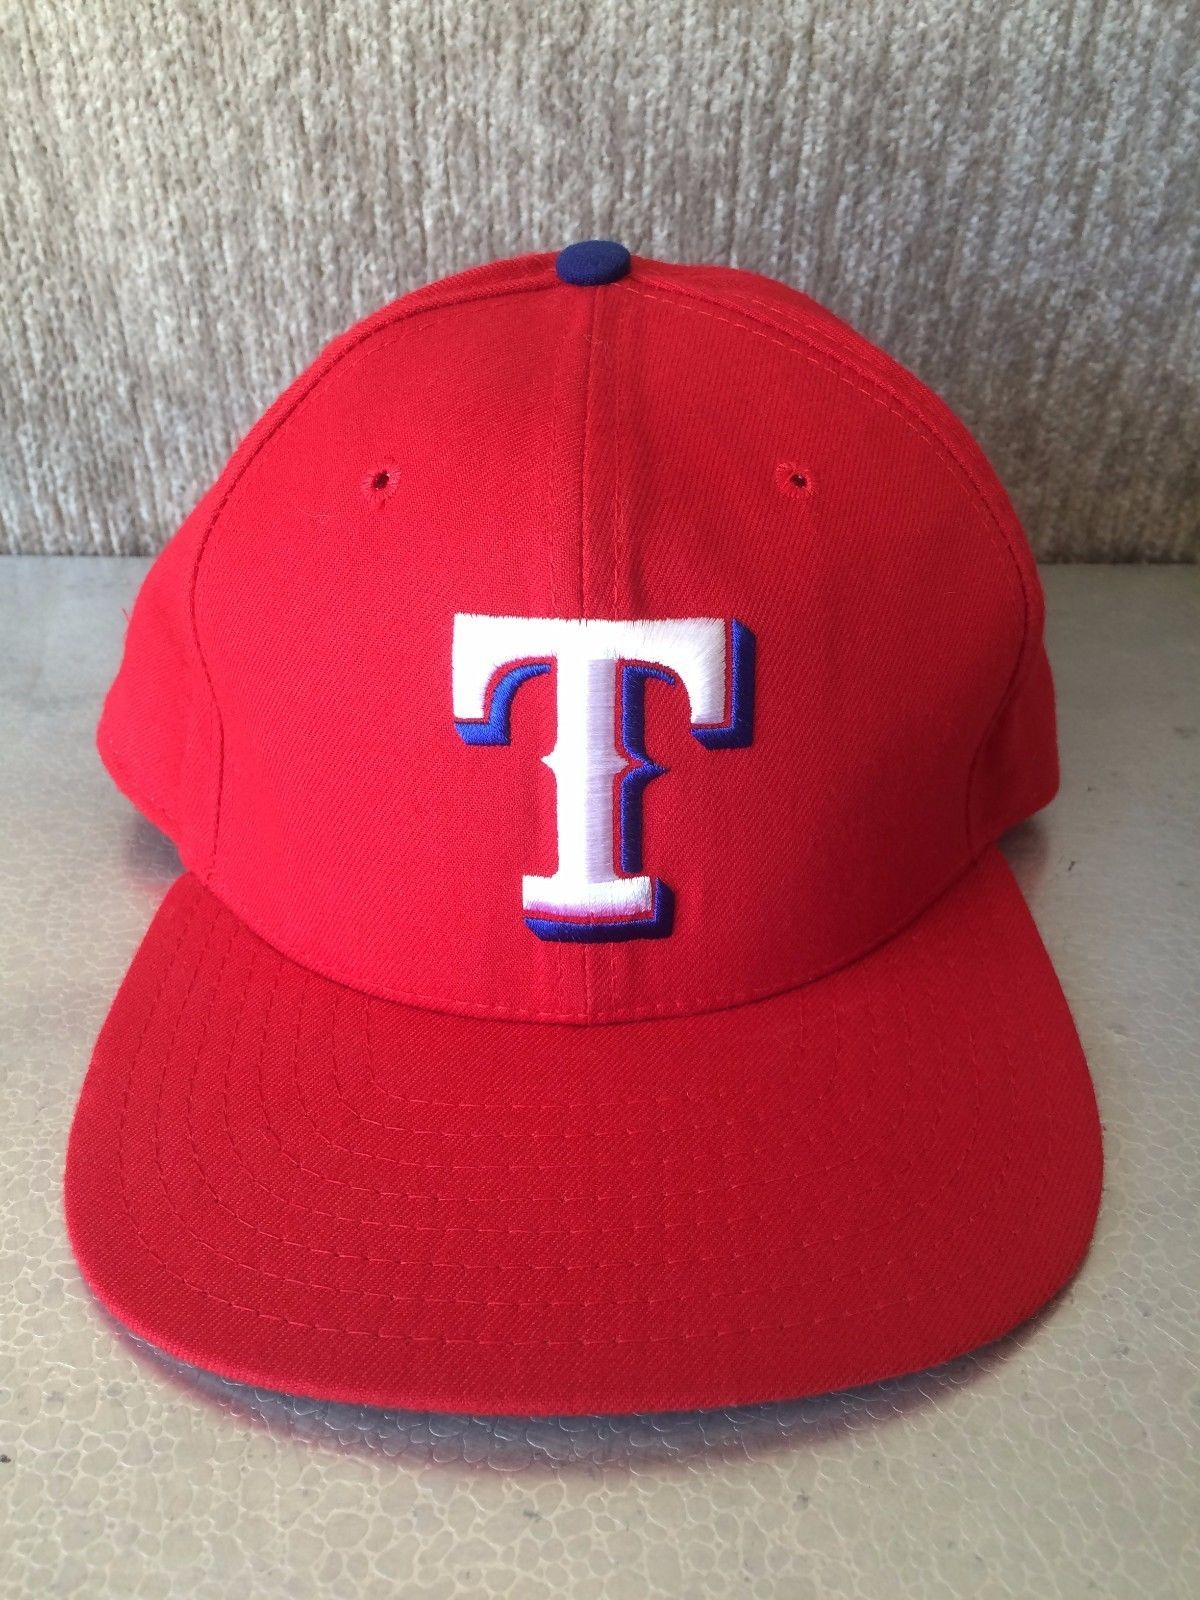 acdca951e80 ... ebay vintage texasrangers red baseball cap newera dupont visor pro med  large snapback hat 68bb7 a471f